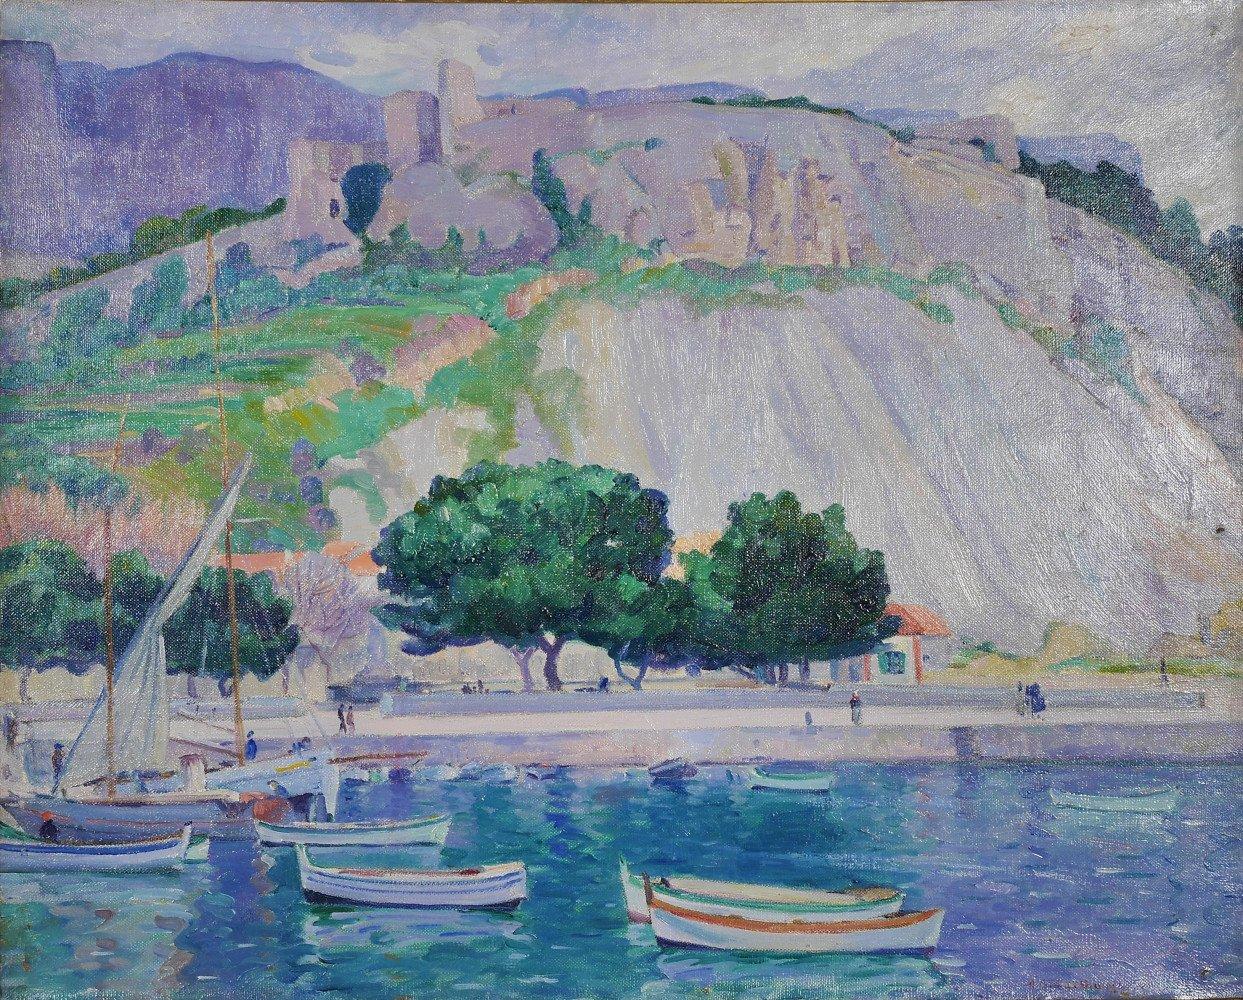 Cliff Rocks, Antibe, France by Abel G. Warshawsky